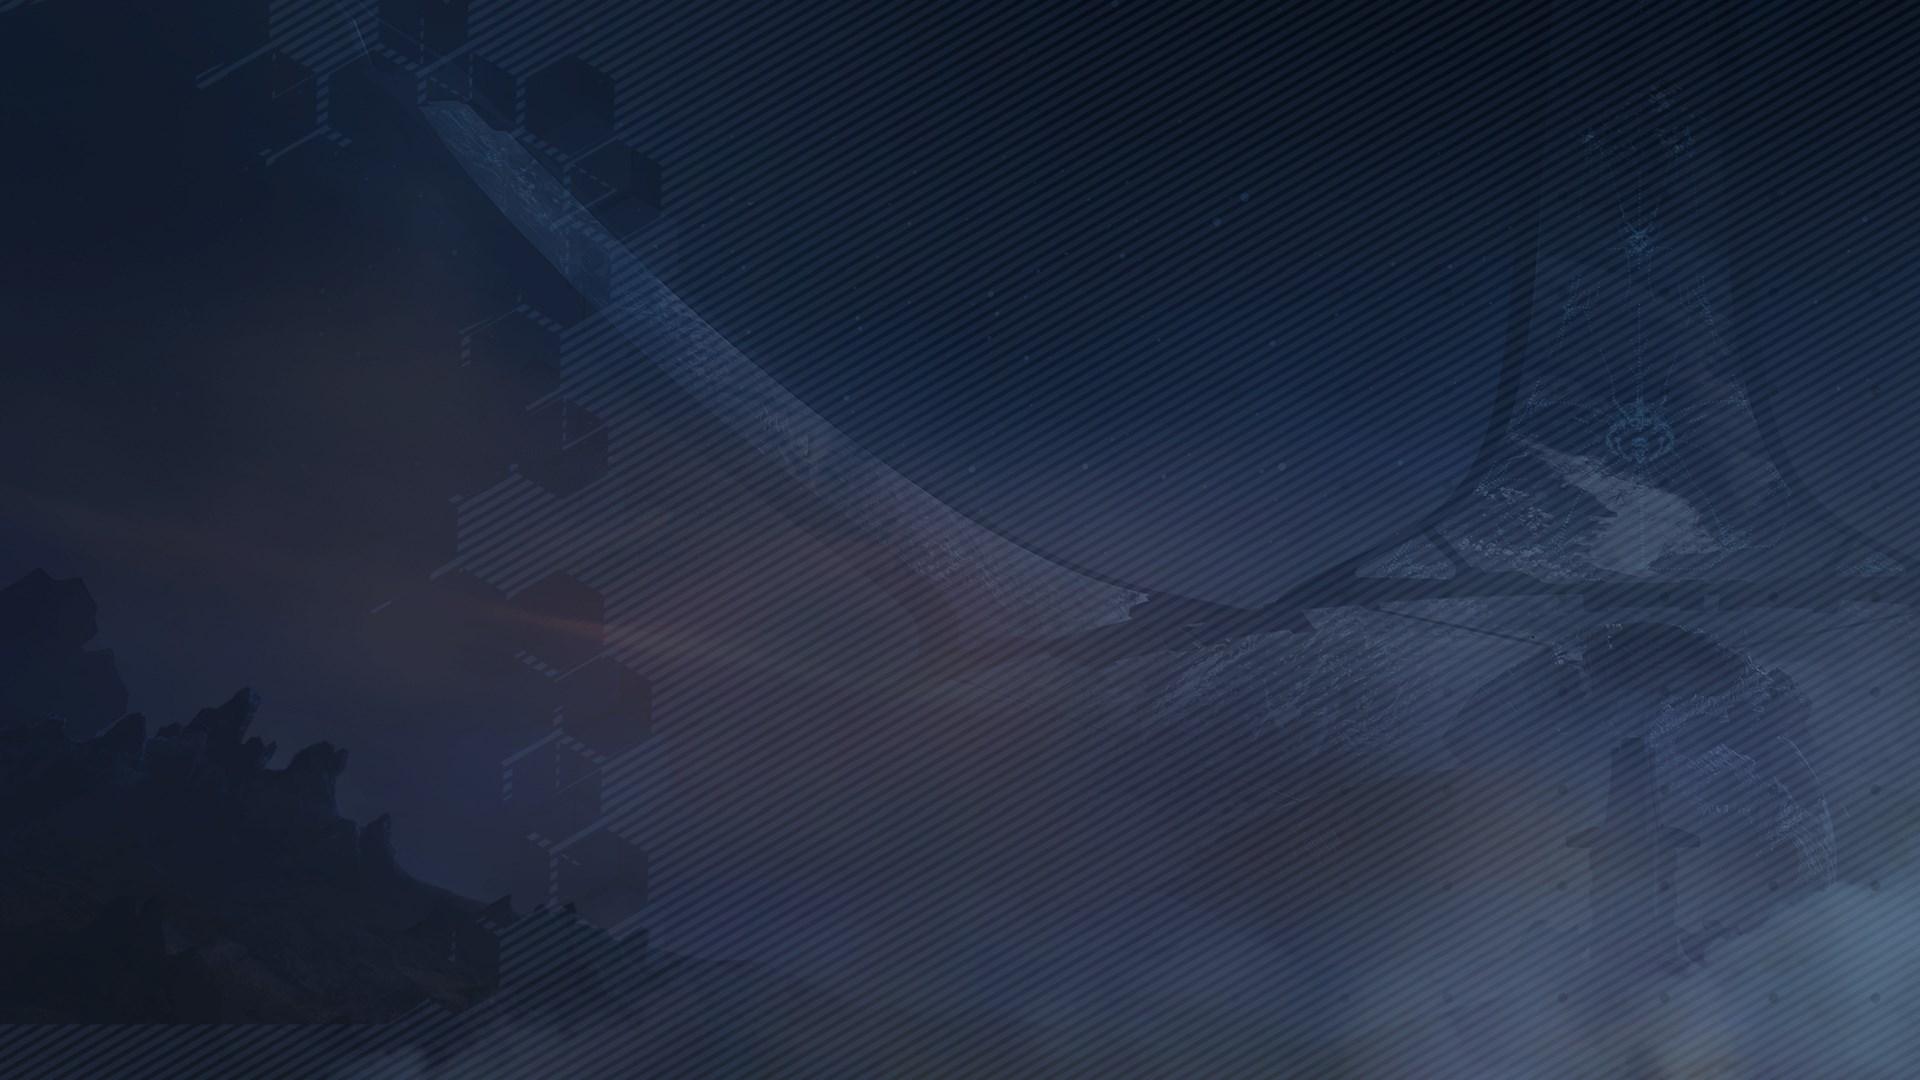 Halo Wars 2: 40 Blitz Packs + 7 Free